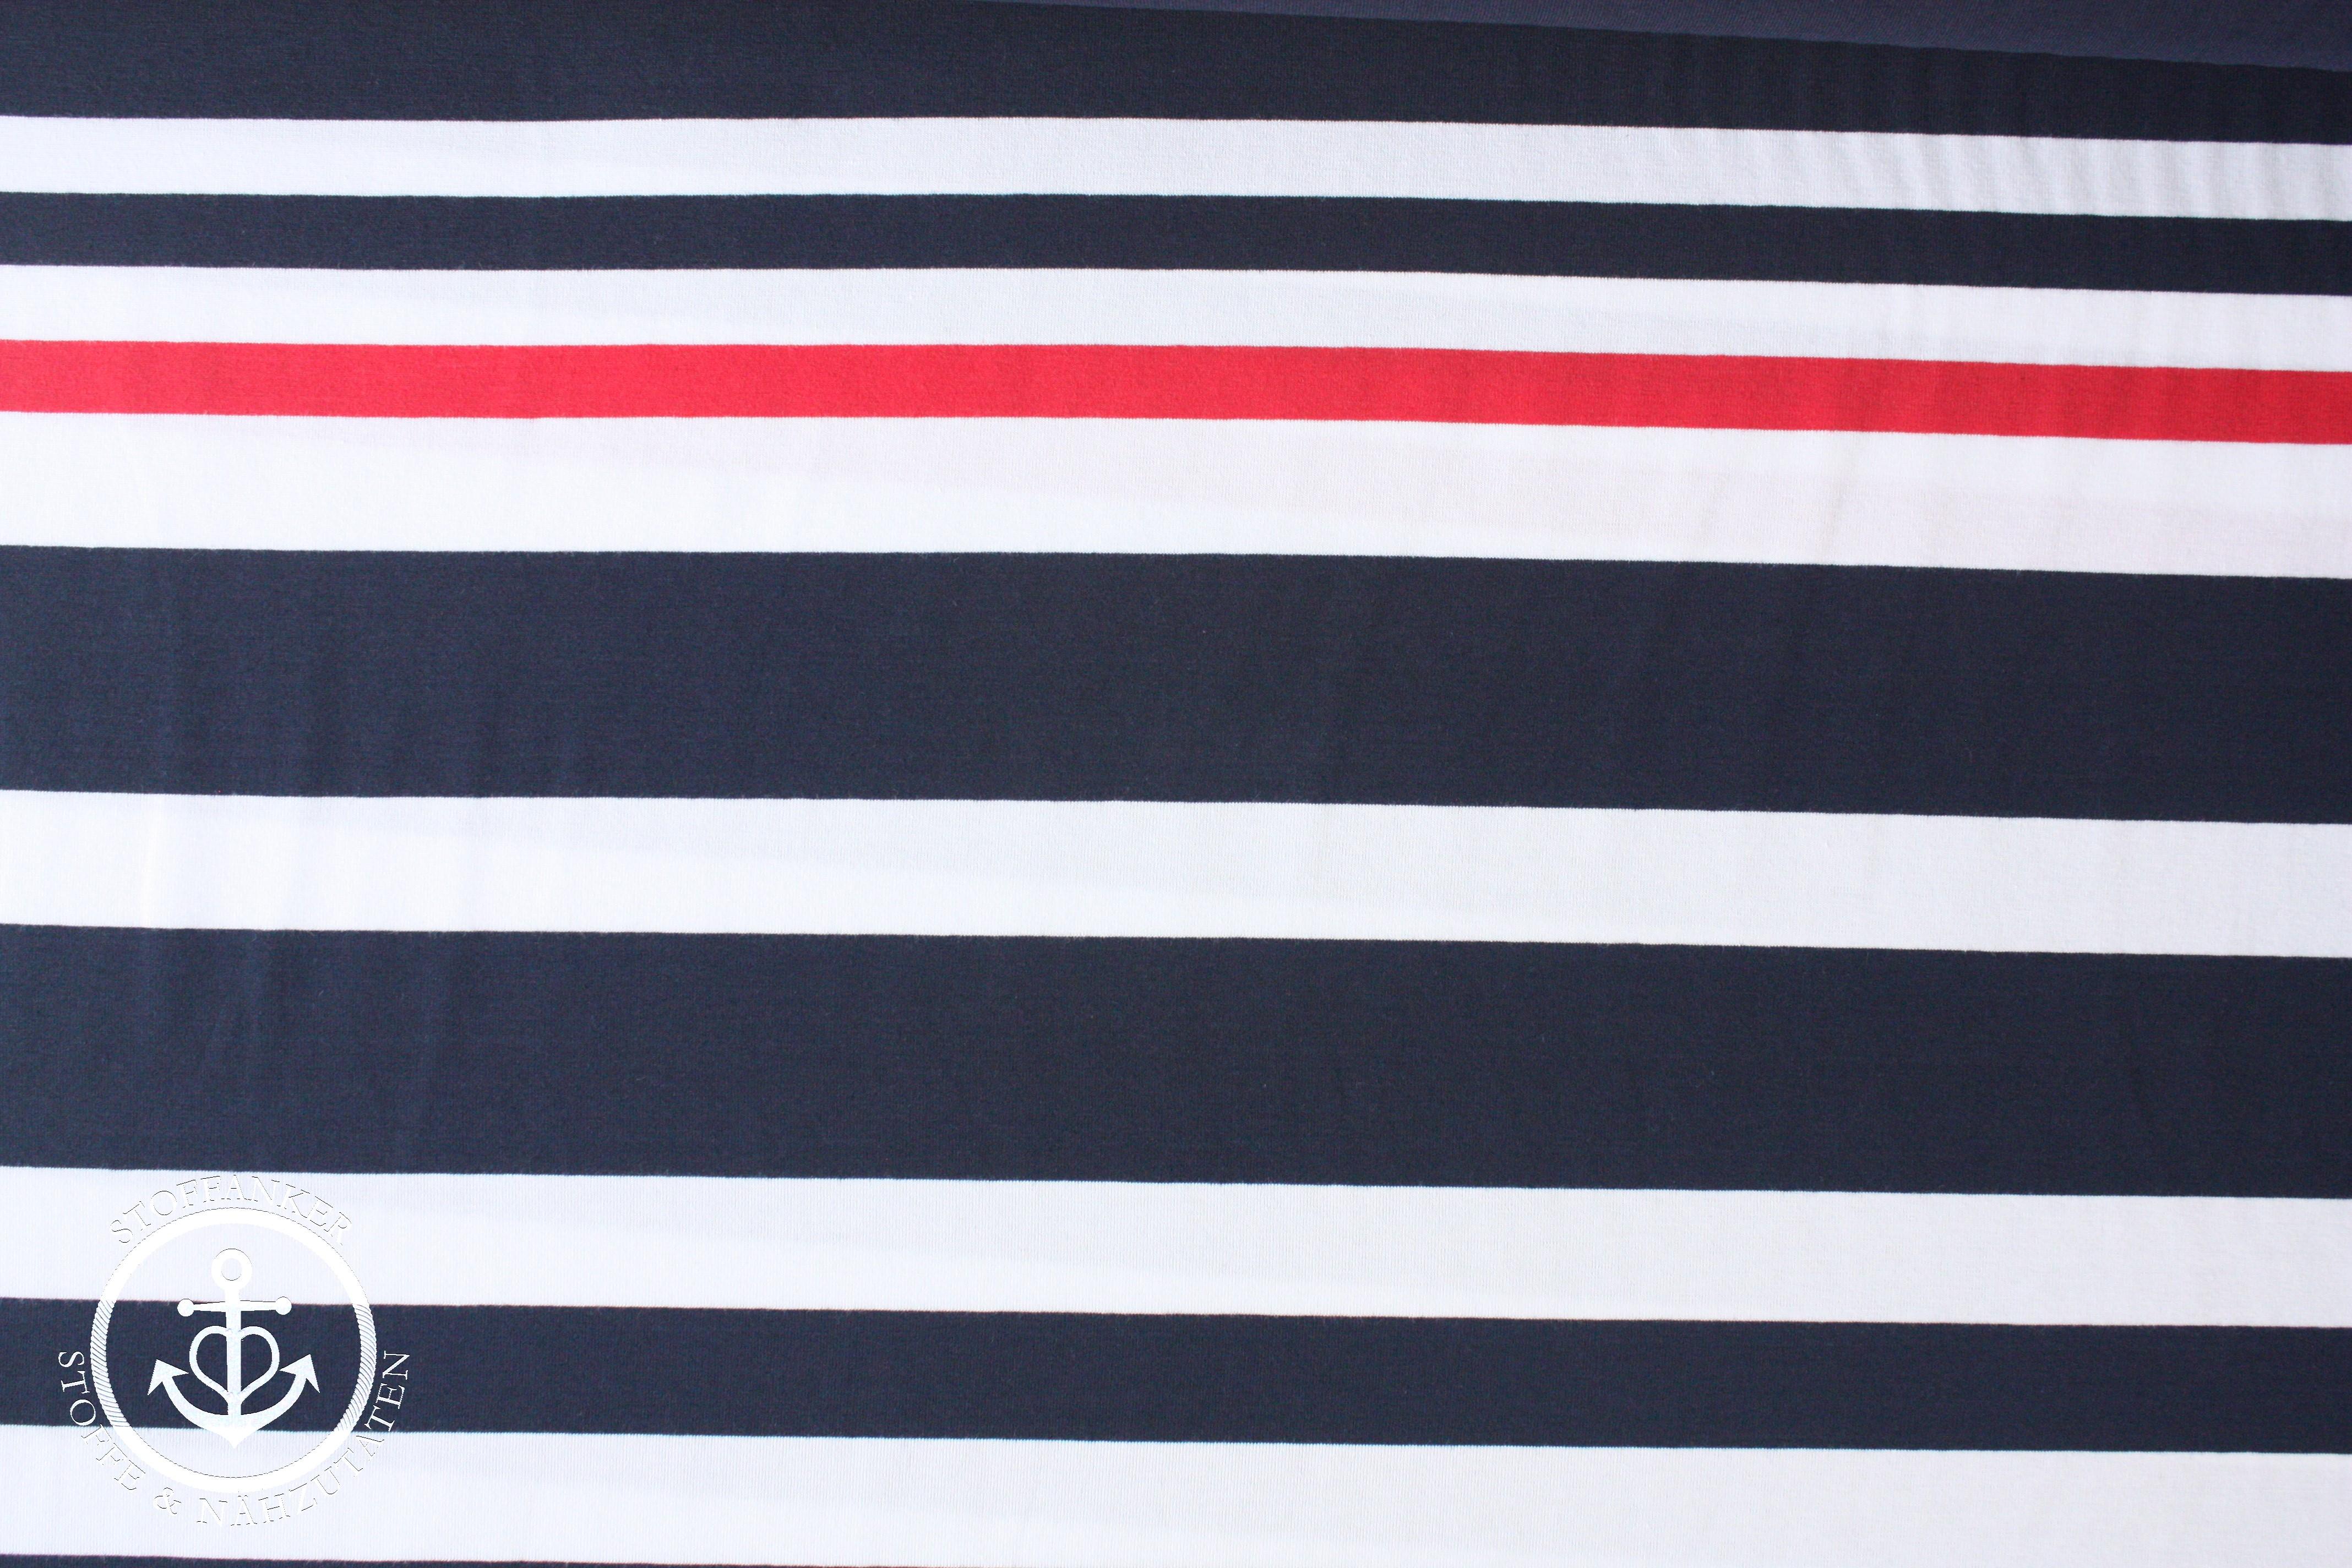 Dekostoff Maritim  0,50 x 1,40 Maritim Streifen blau//beige//weiß I